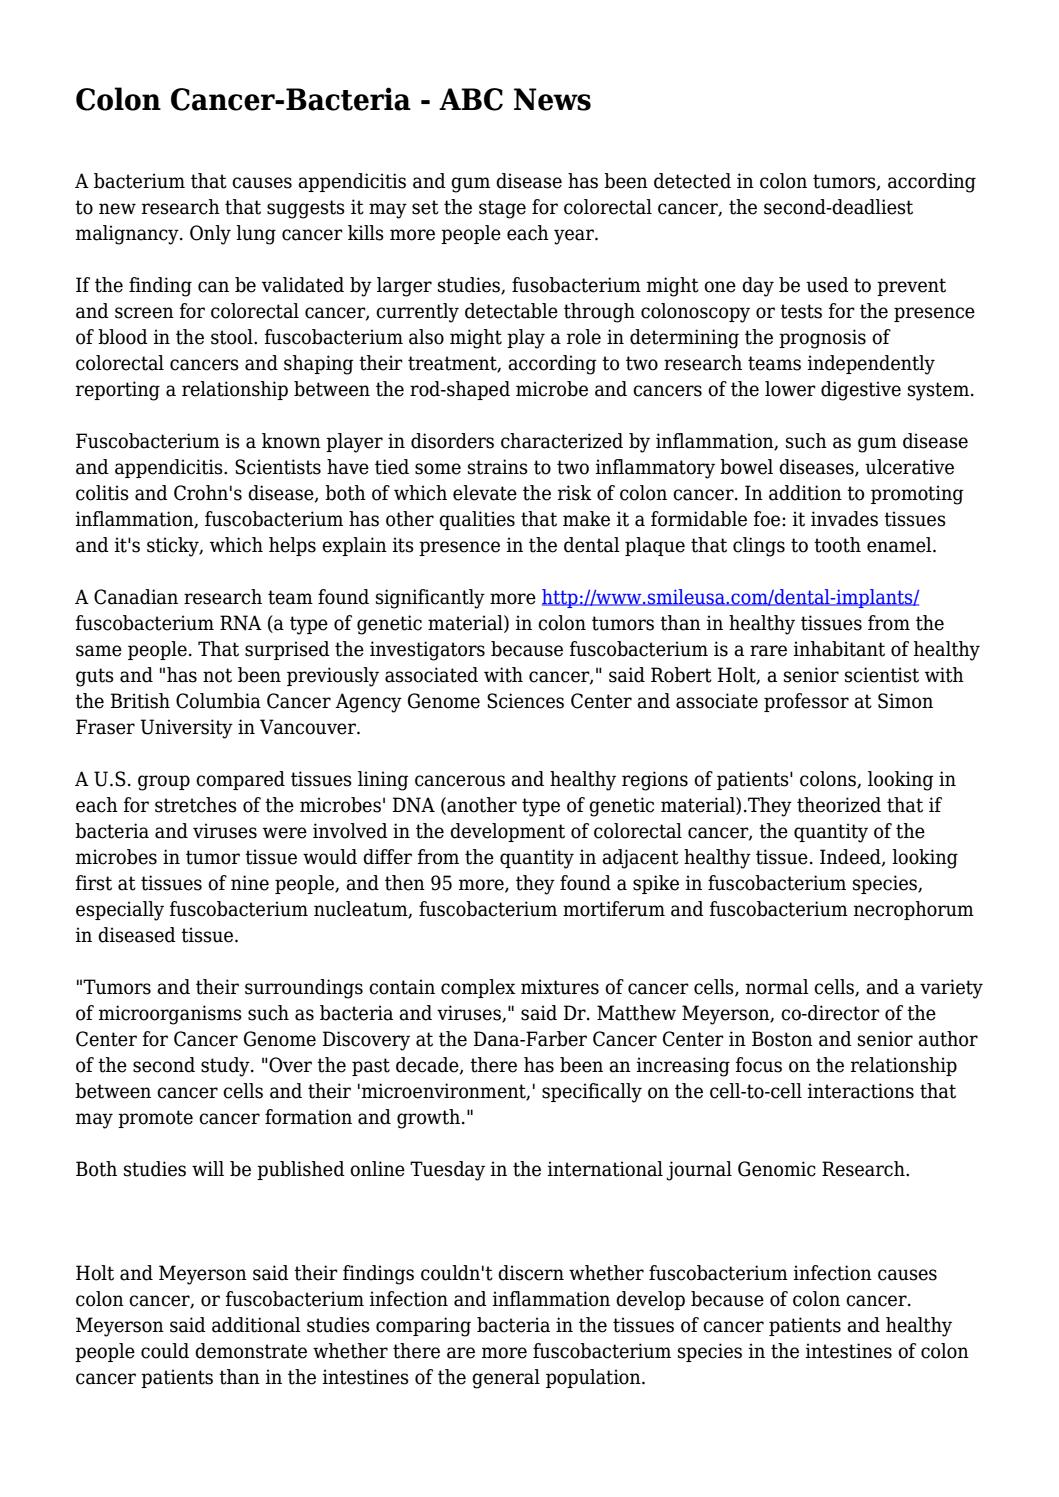 Colon Cancer Bacteria Abc News By Groovycuff7668 Issuu